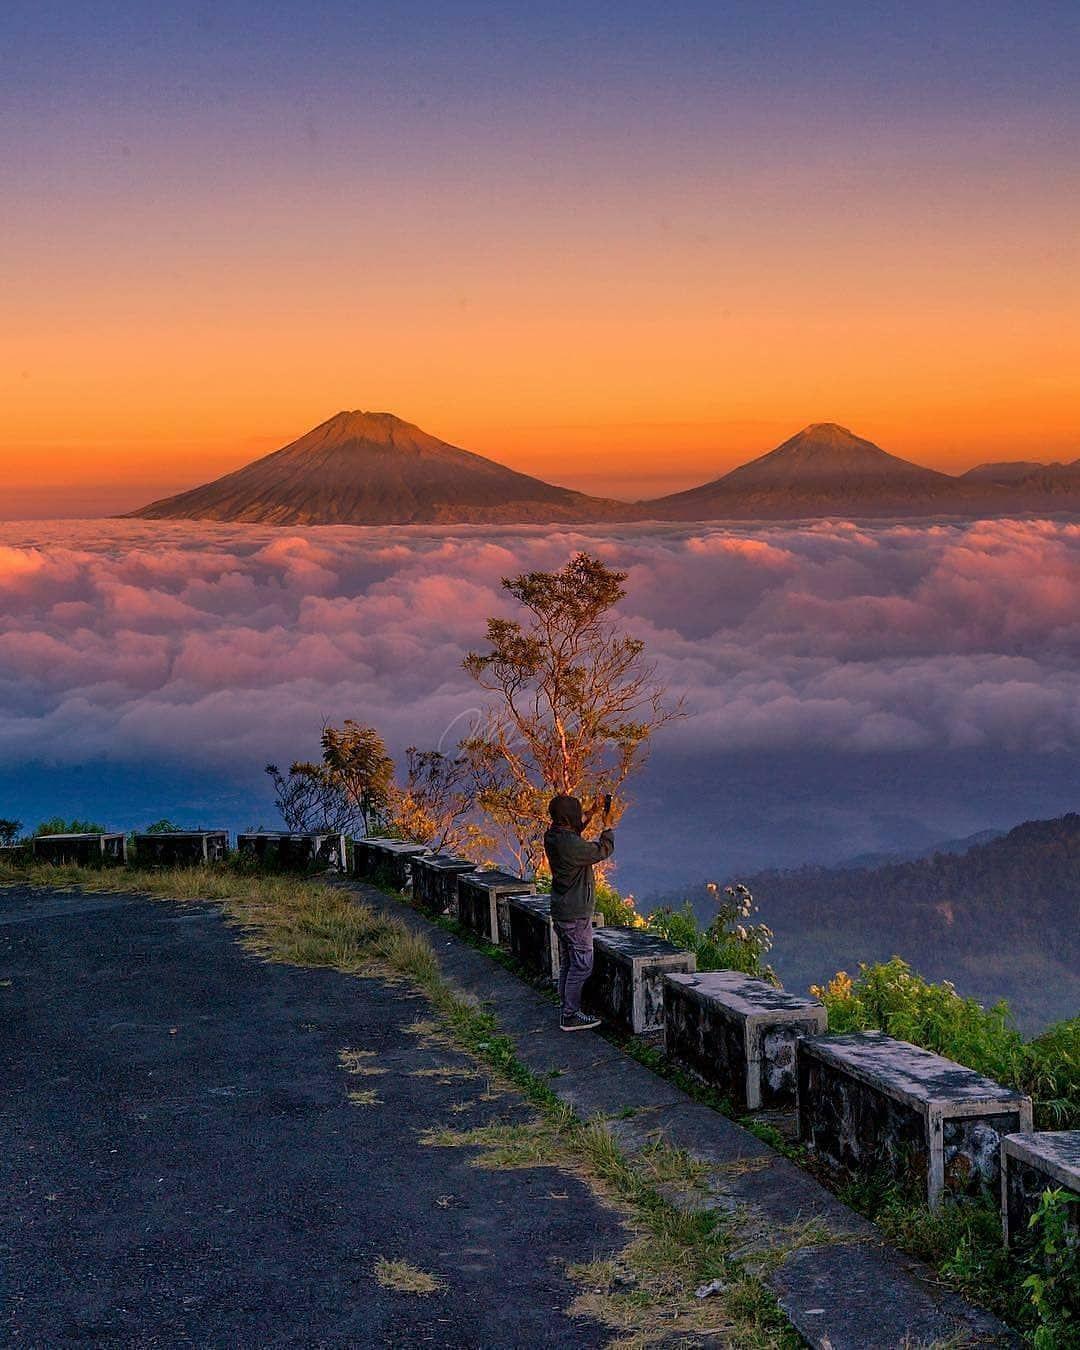 Sedang Viral! ini Dia 9 Lokasi Wisata Negeri di Atas Awan yang